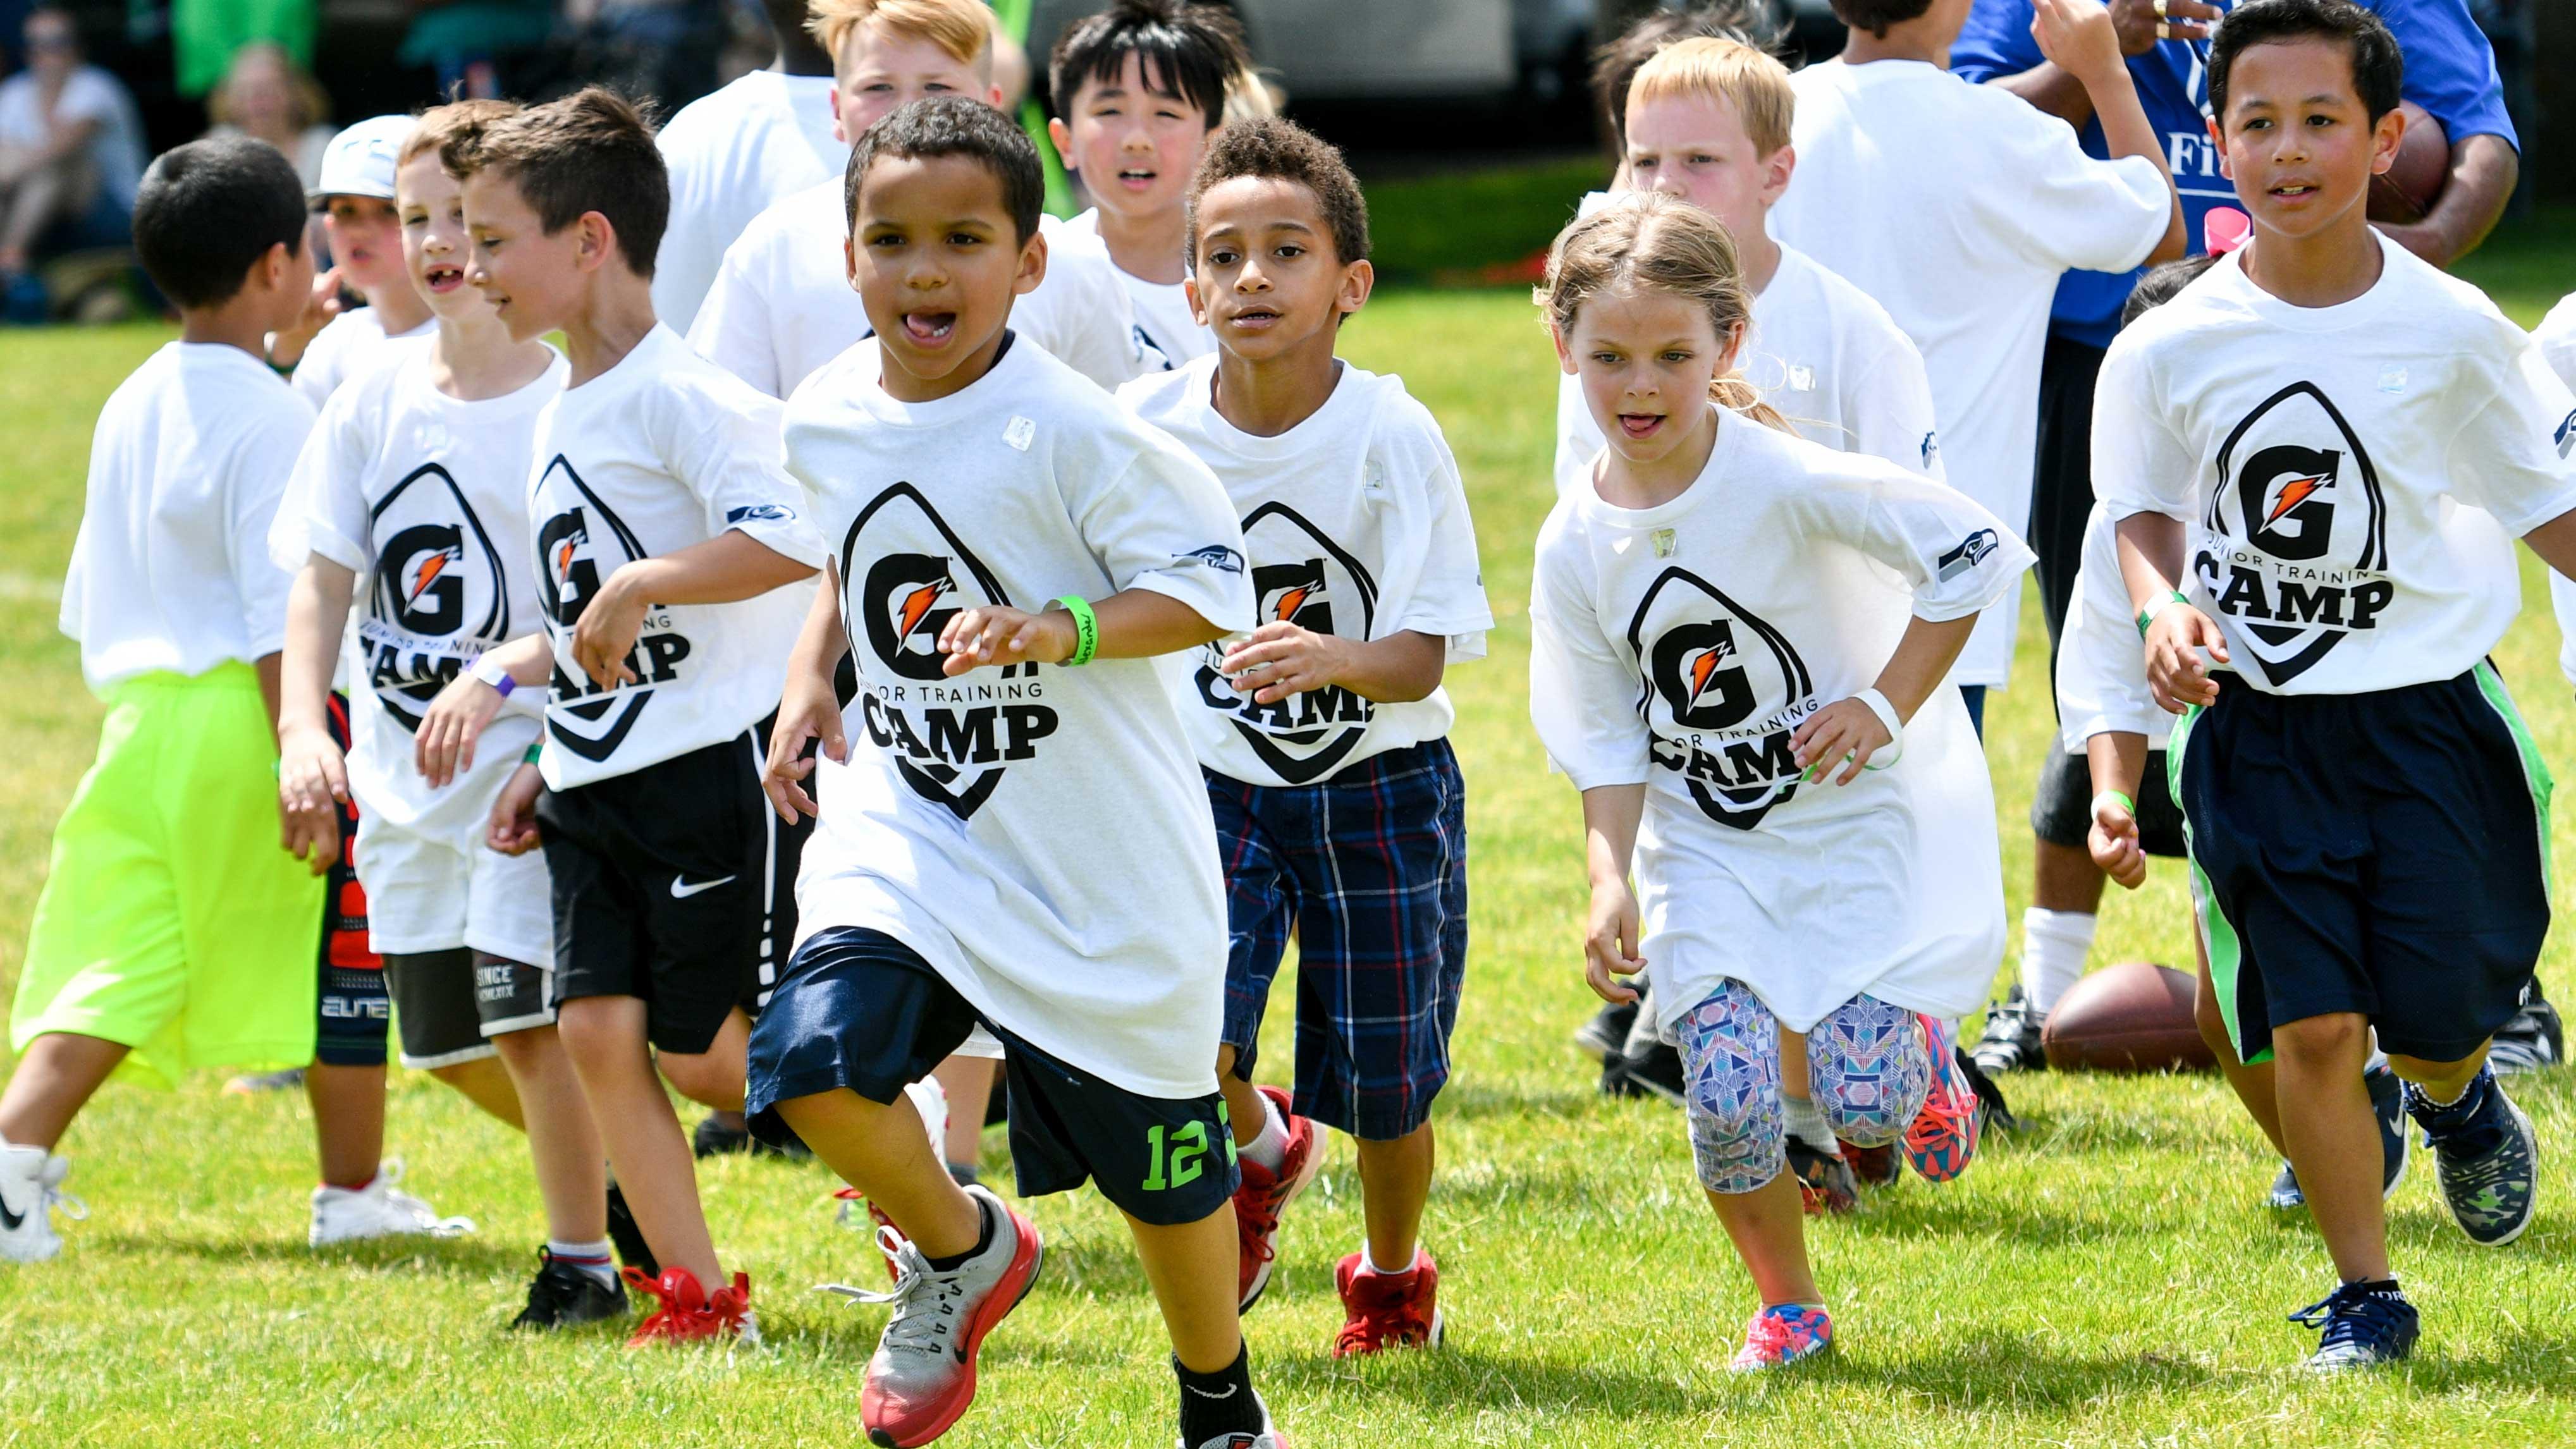 Gatorade Junior Training Camps